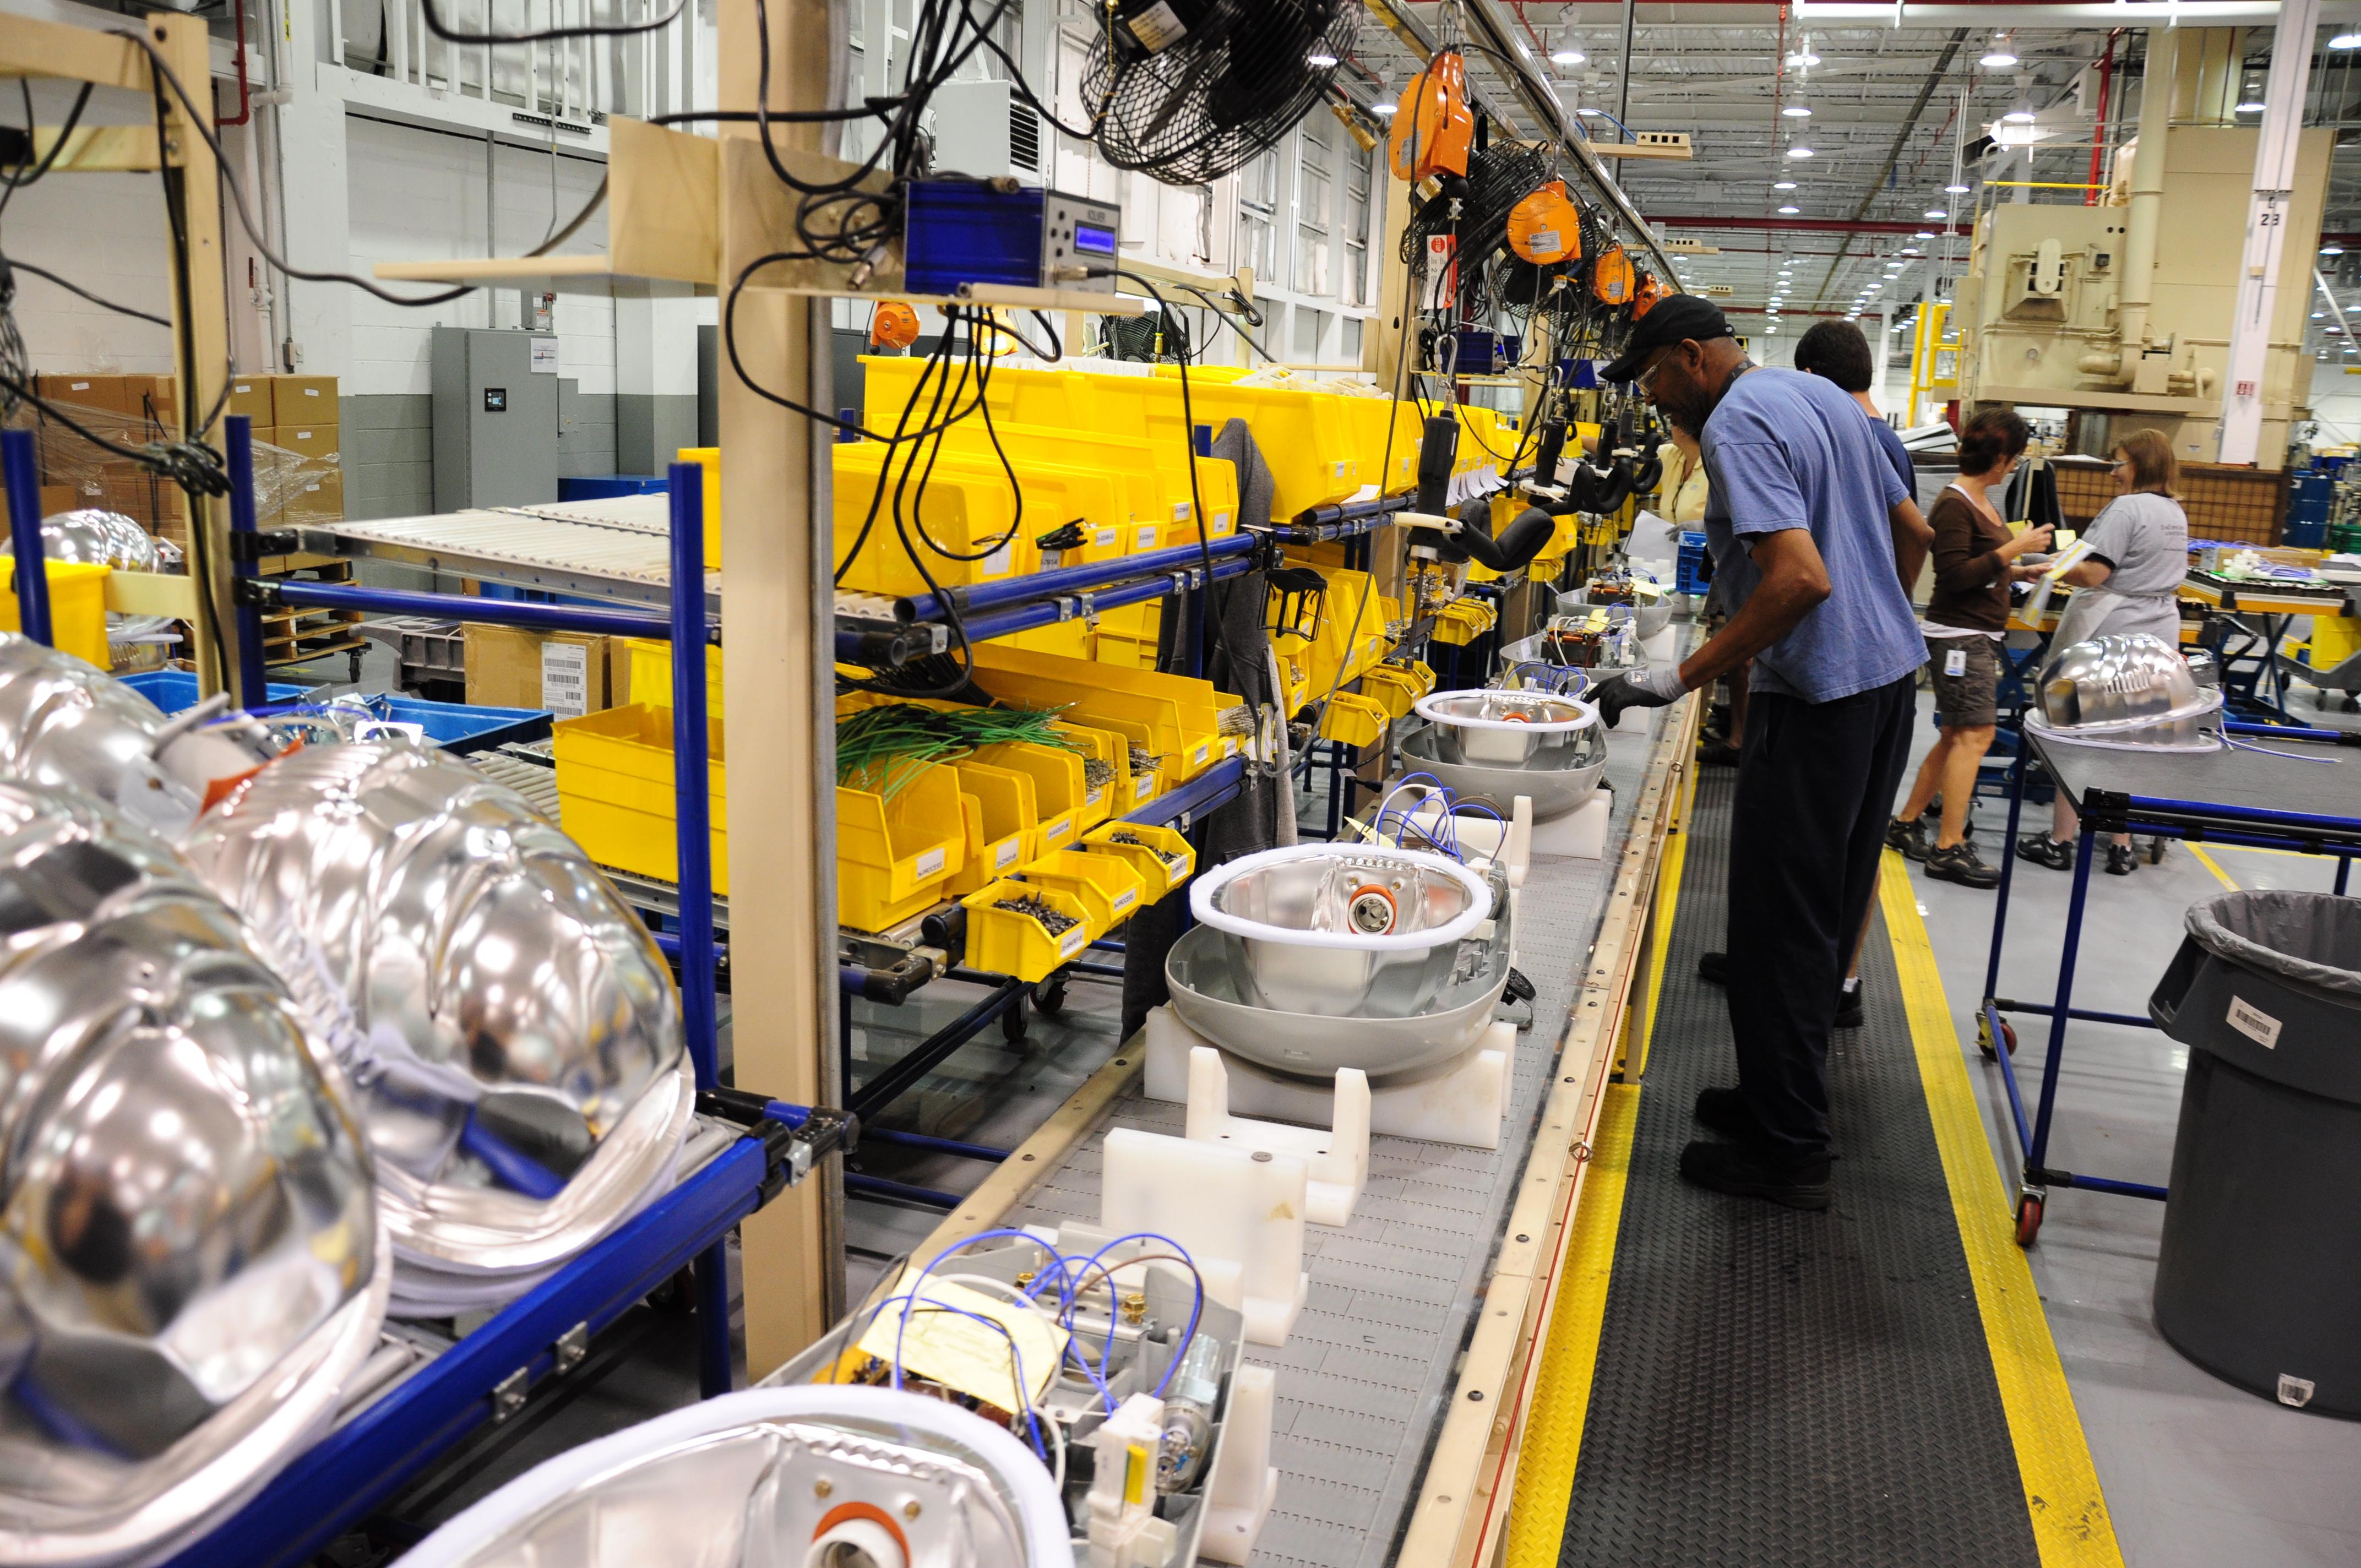 GE Lightings Hendersonville plant delivers quality lighting